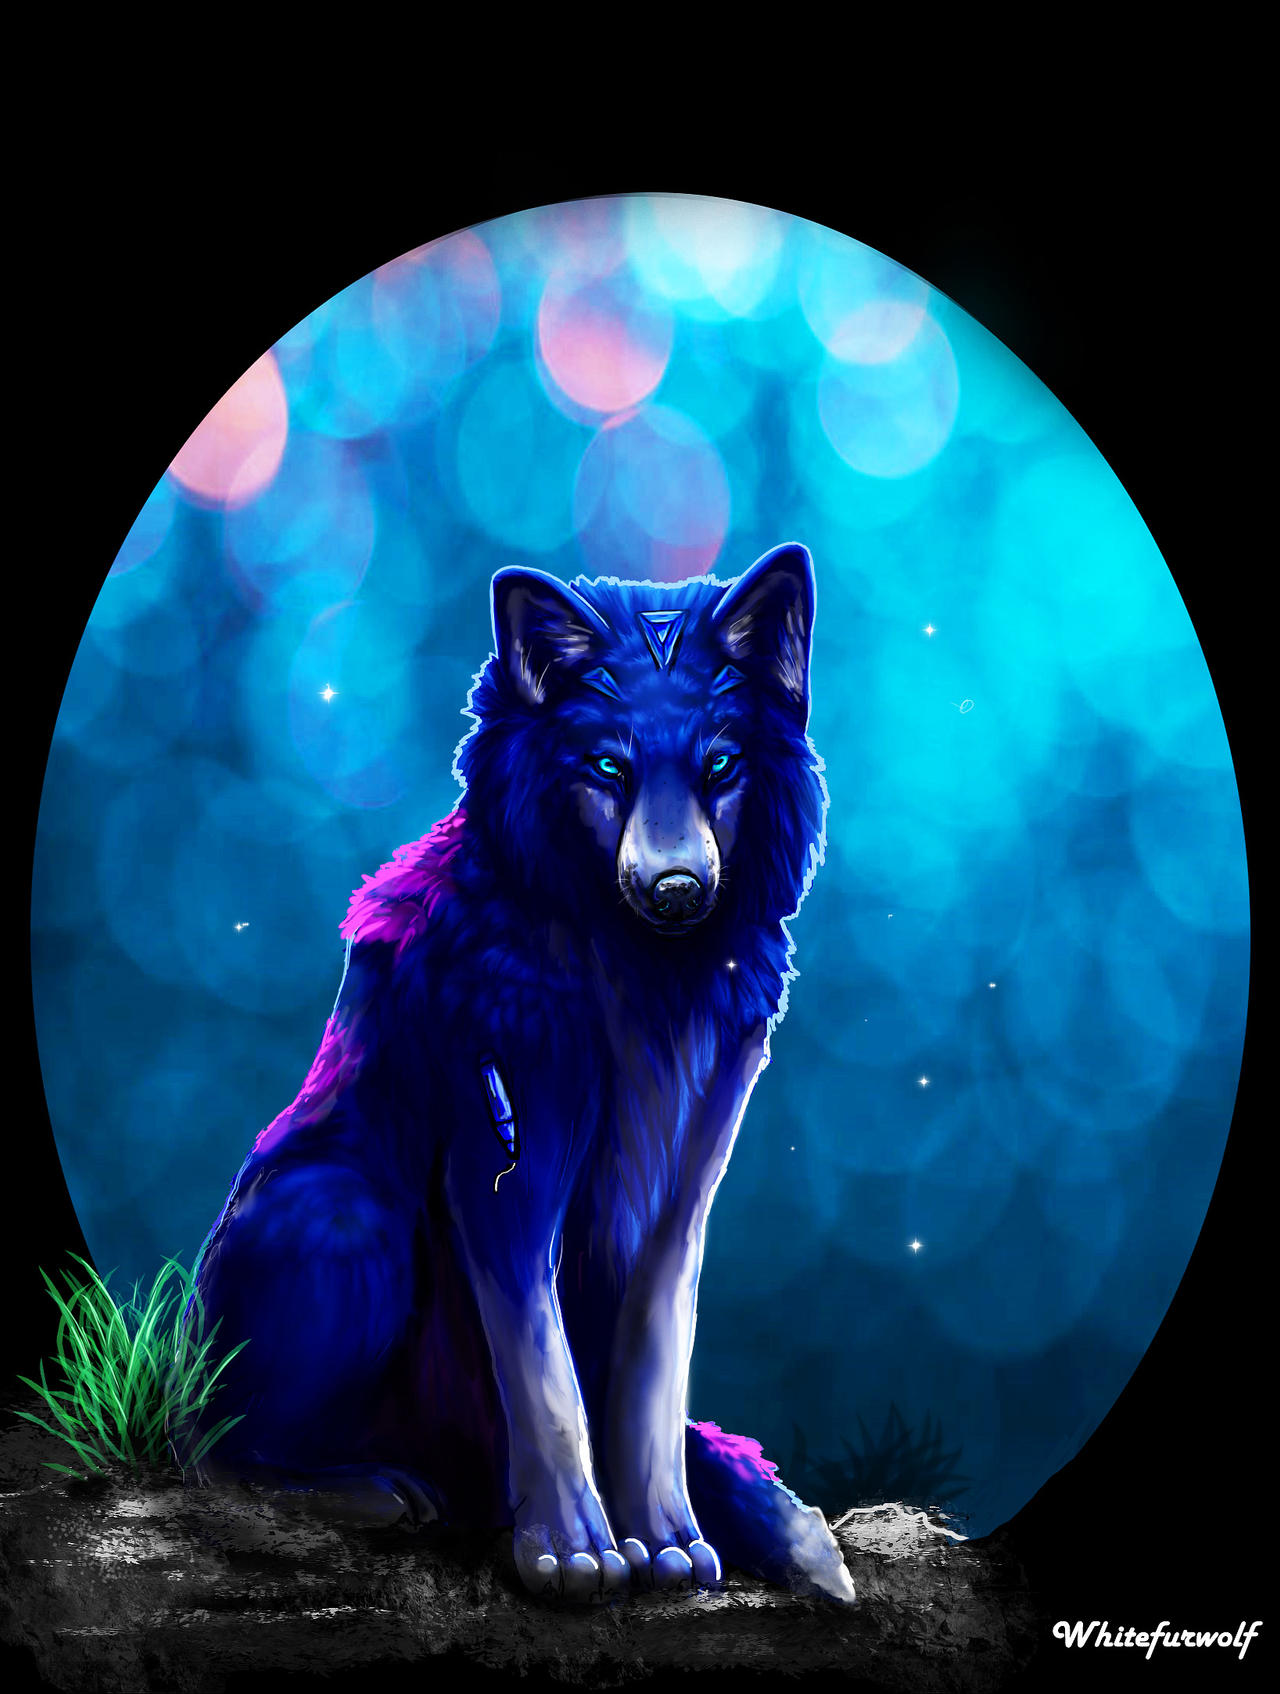 Whitefurwolf's Profile Picture